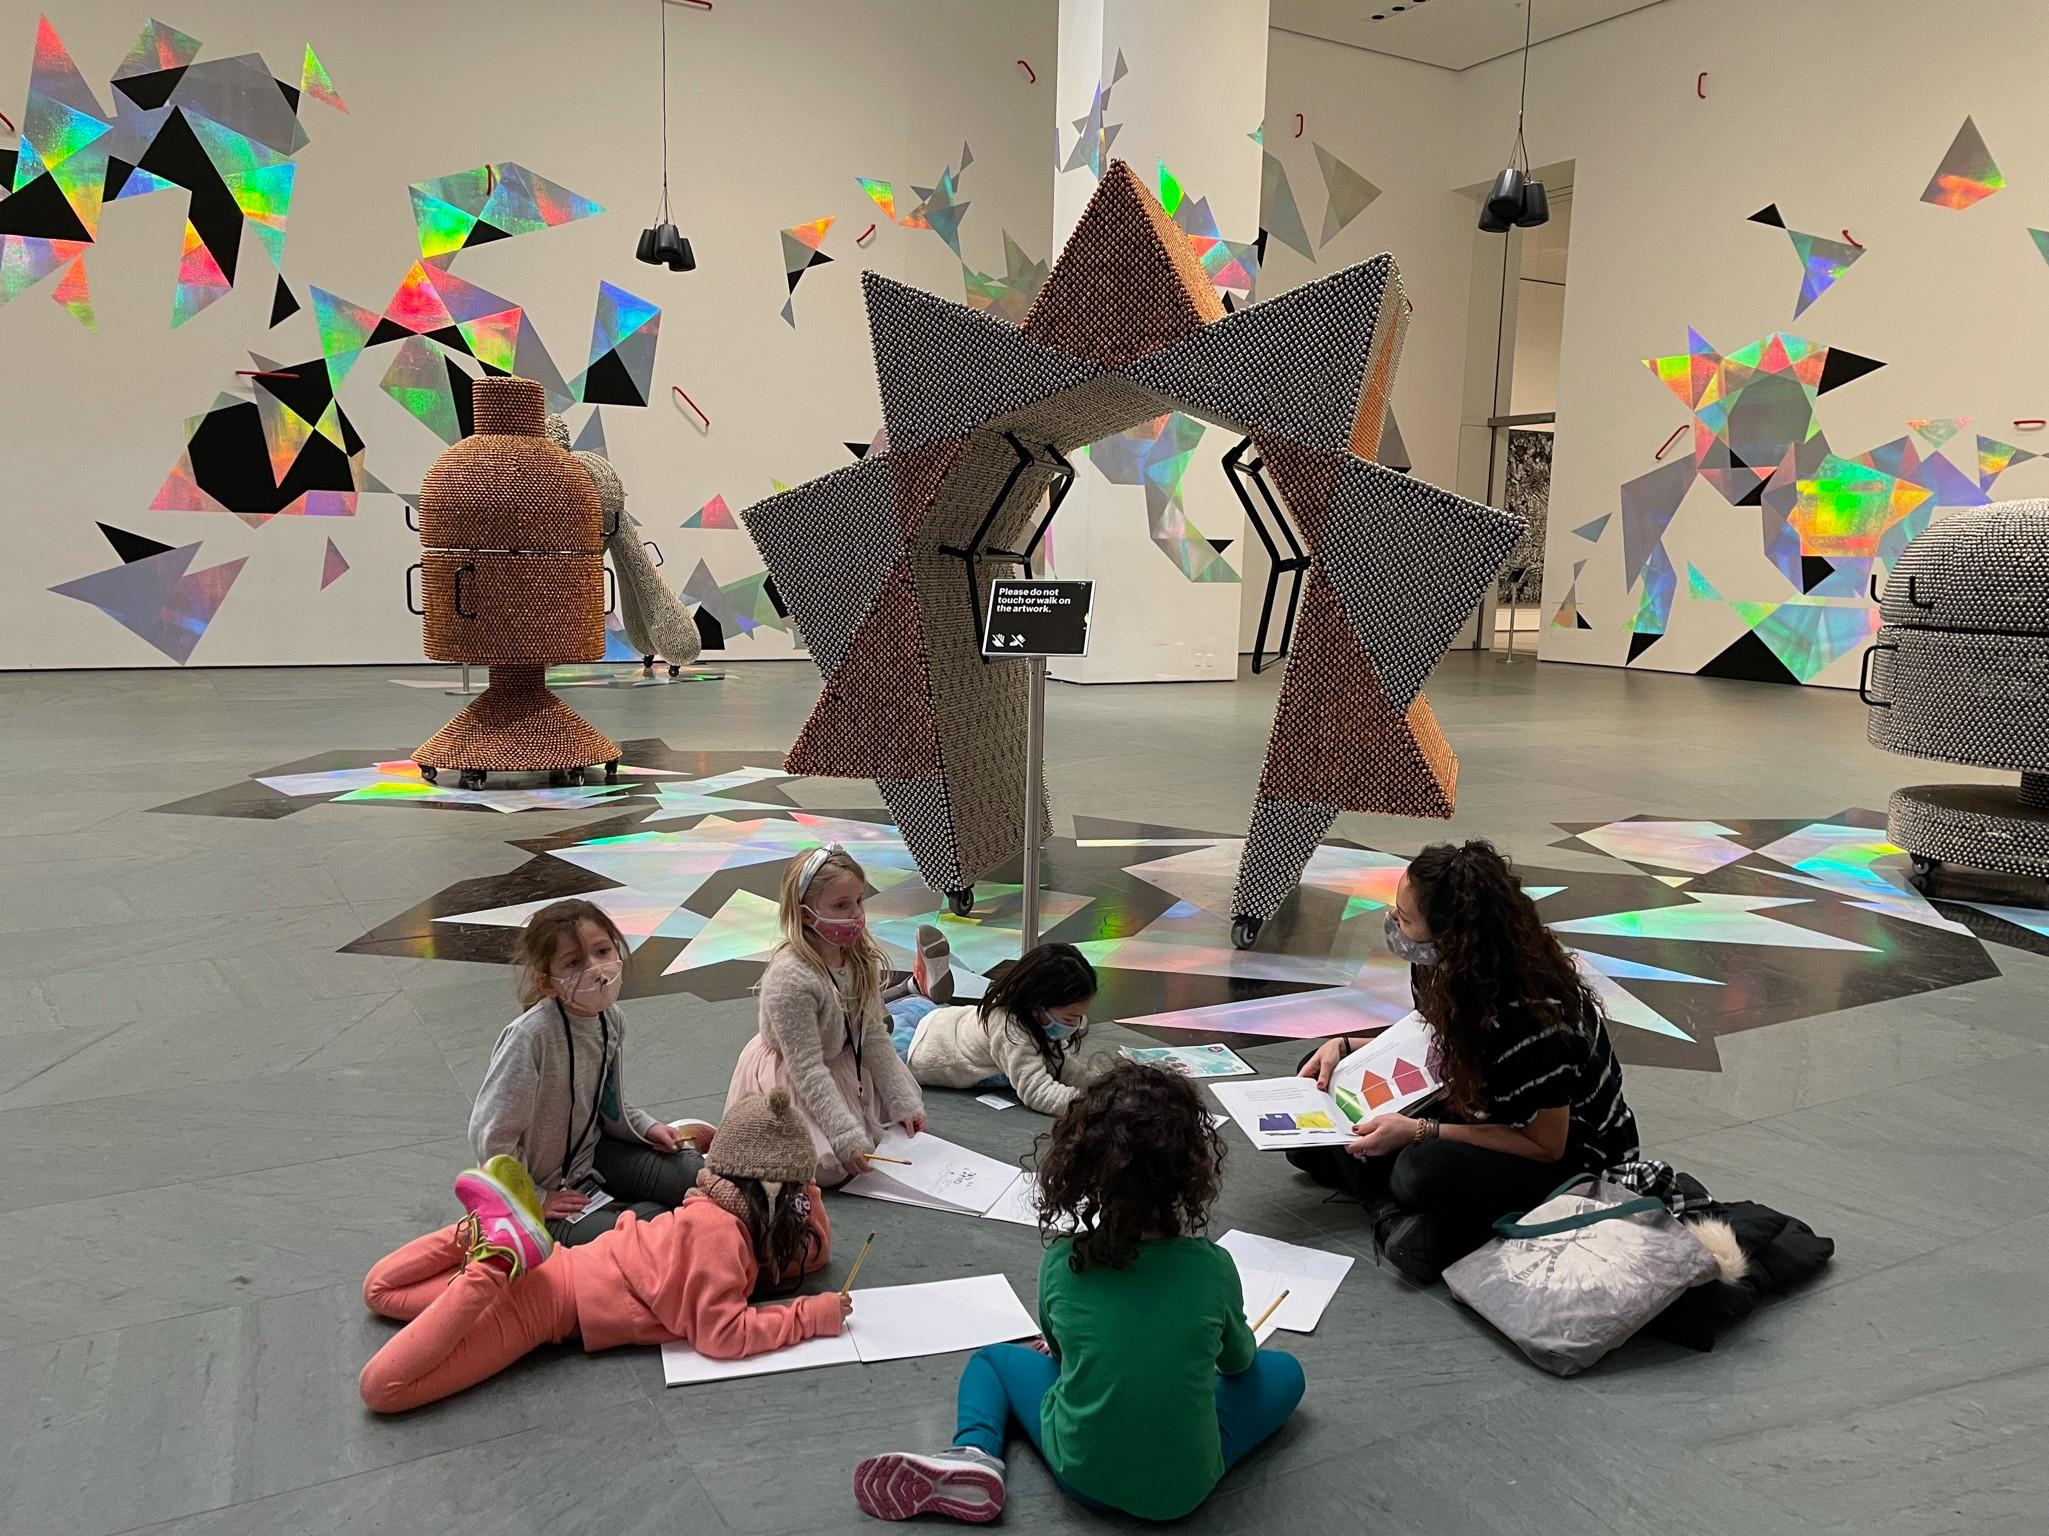 Exploring the NYC Art World (UWS)